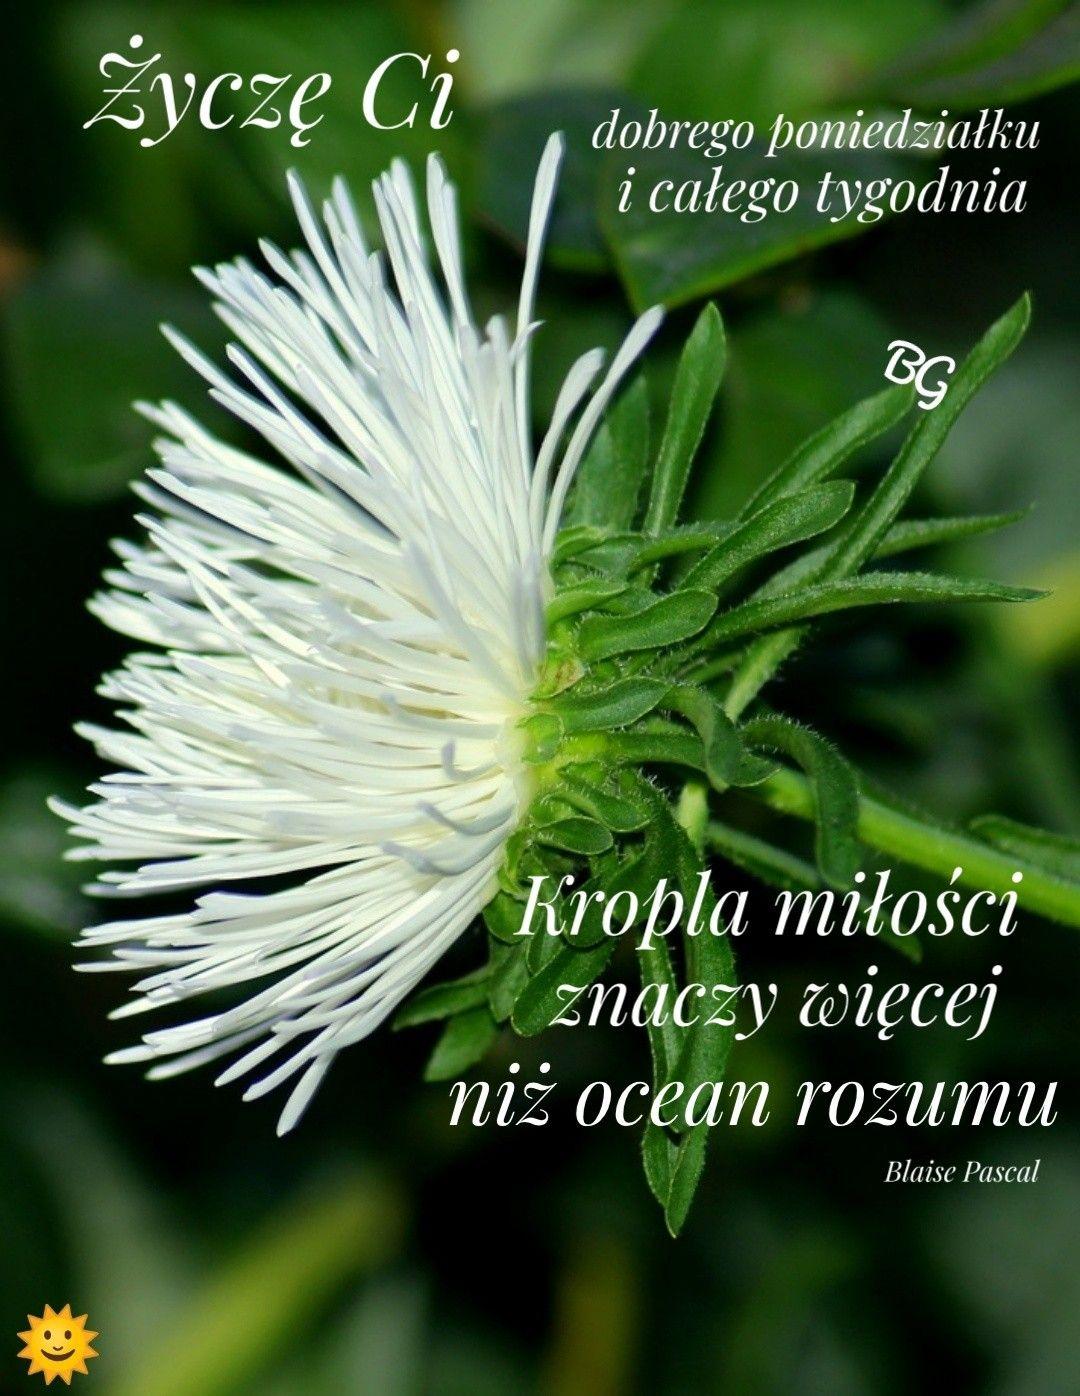 Pin By Elzbieta Baranowska On Cytaty Zyciowe Herbs Dandelion